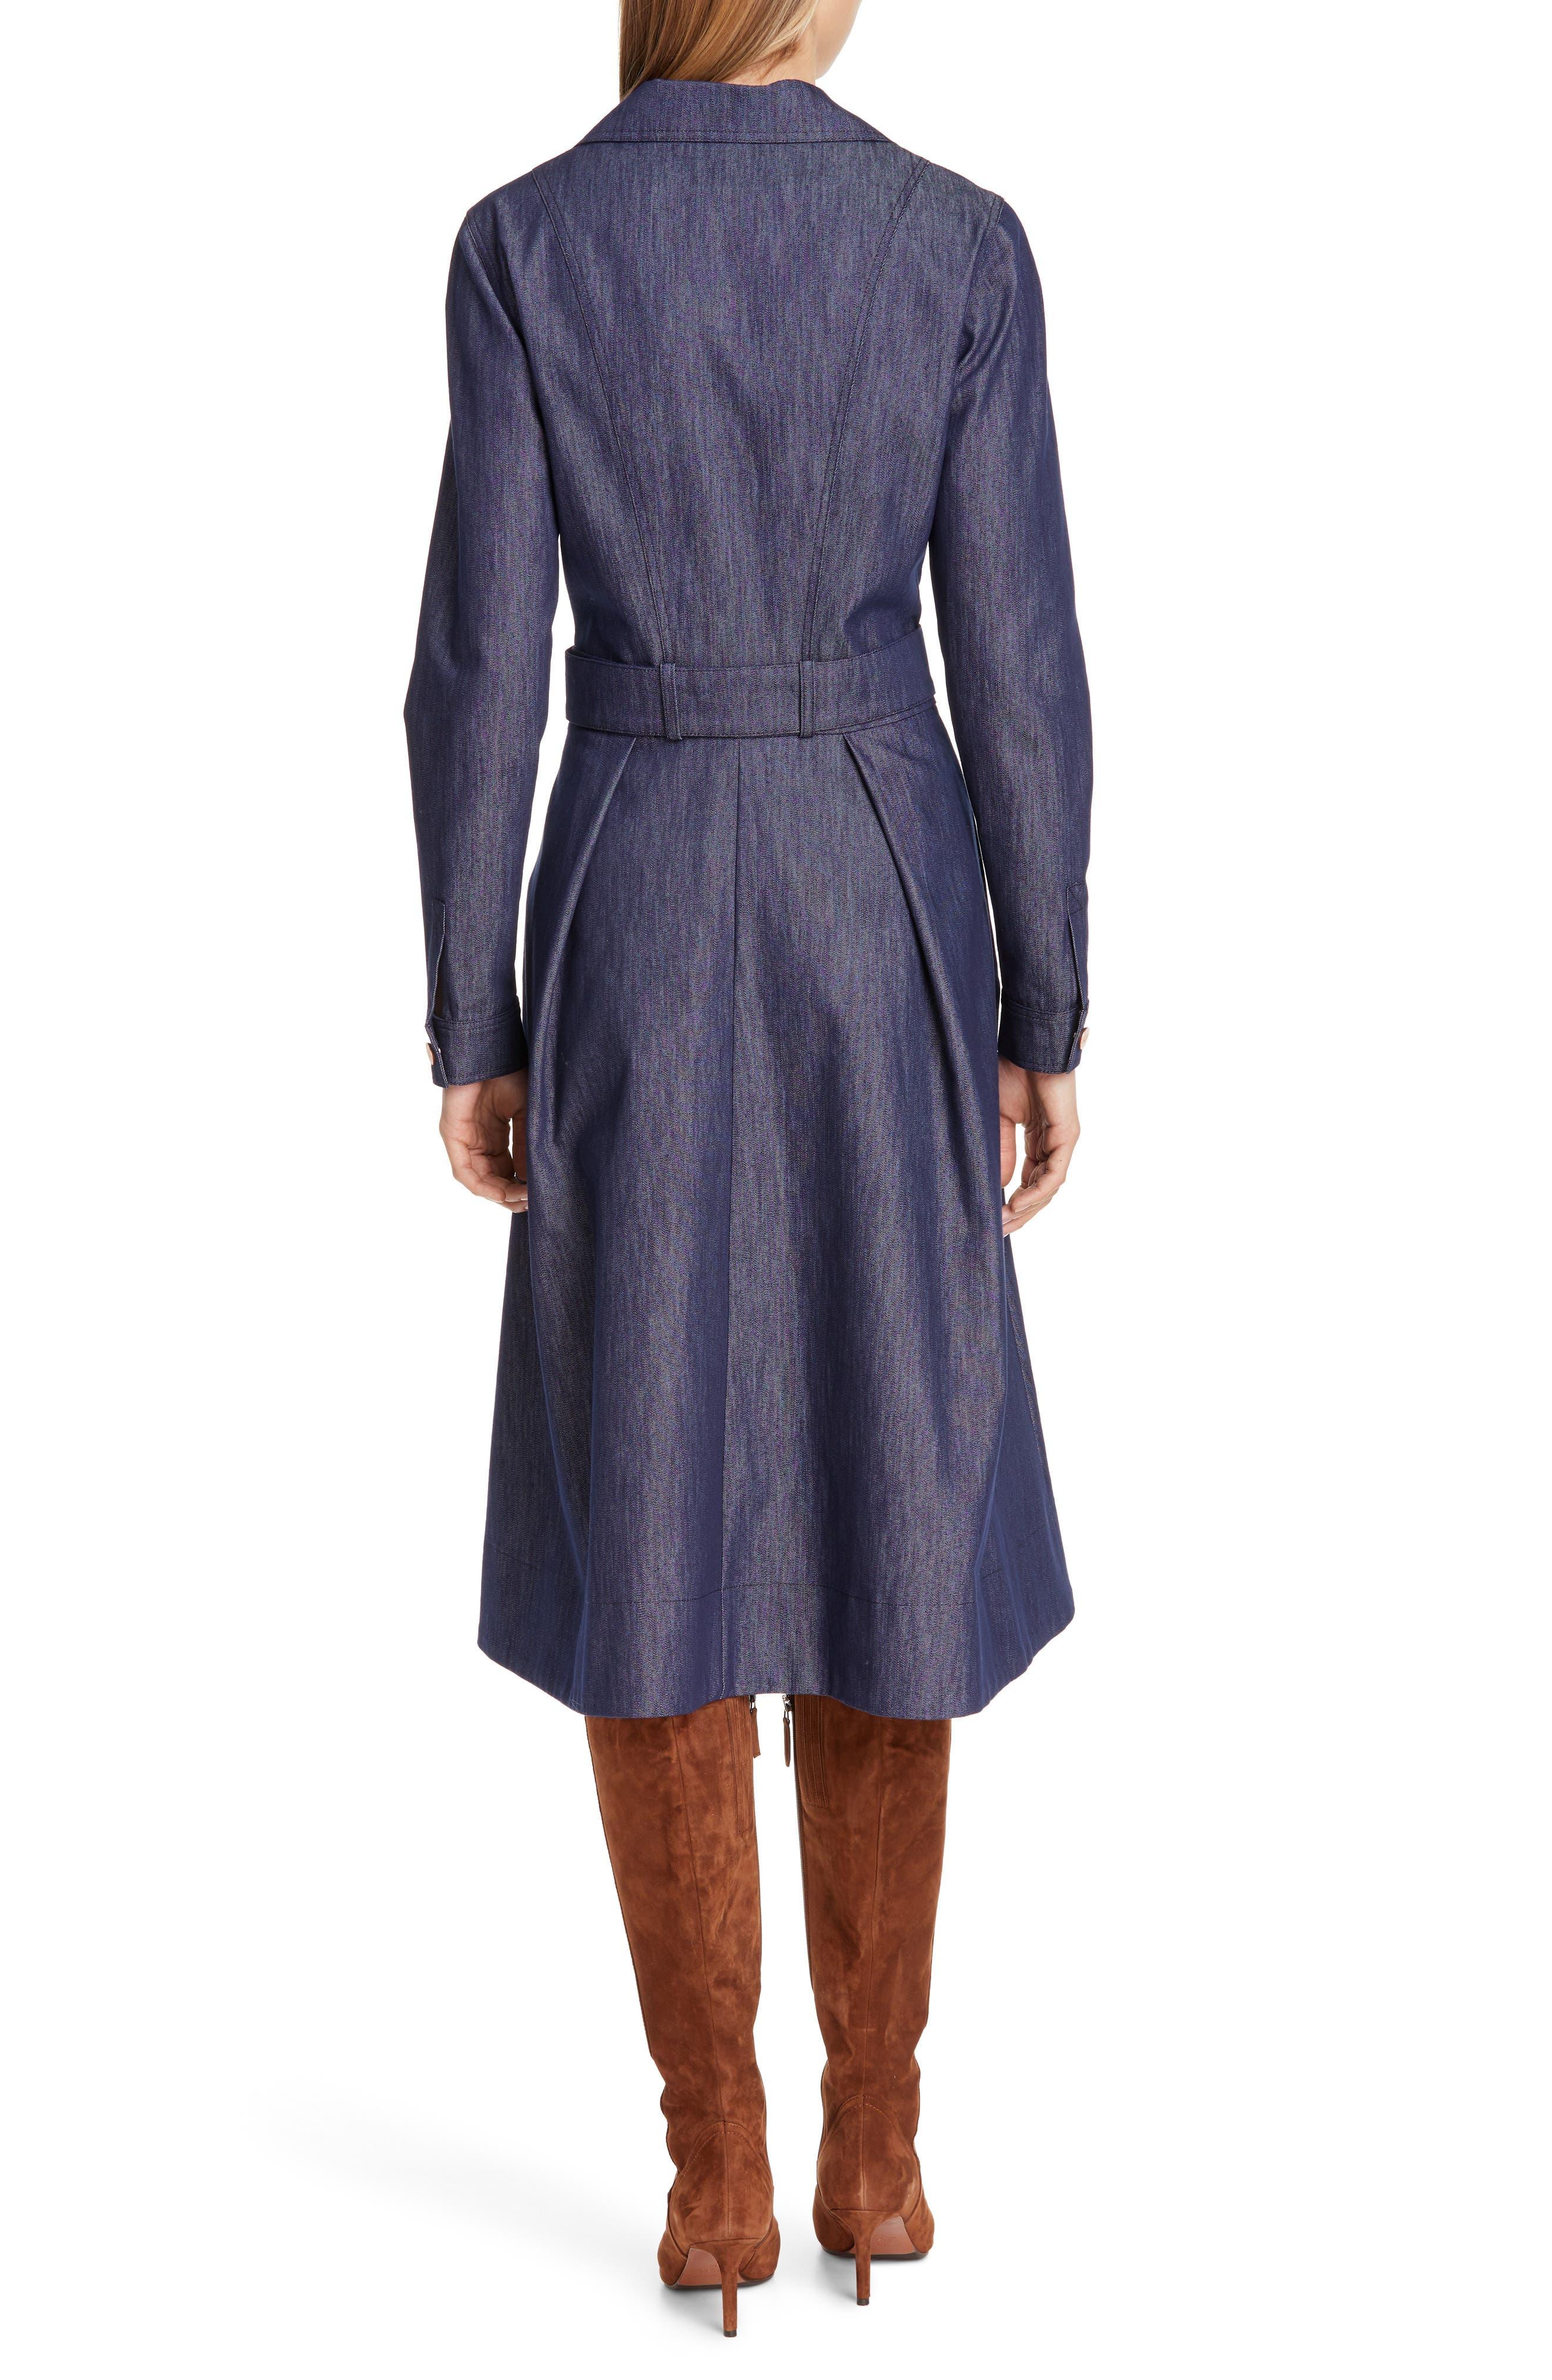 TOMMY X ZENDAYA, Belted Denim Dress, Alternate thumbnail 2, color, DENIM BLUE